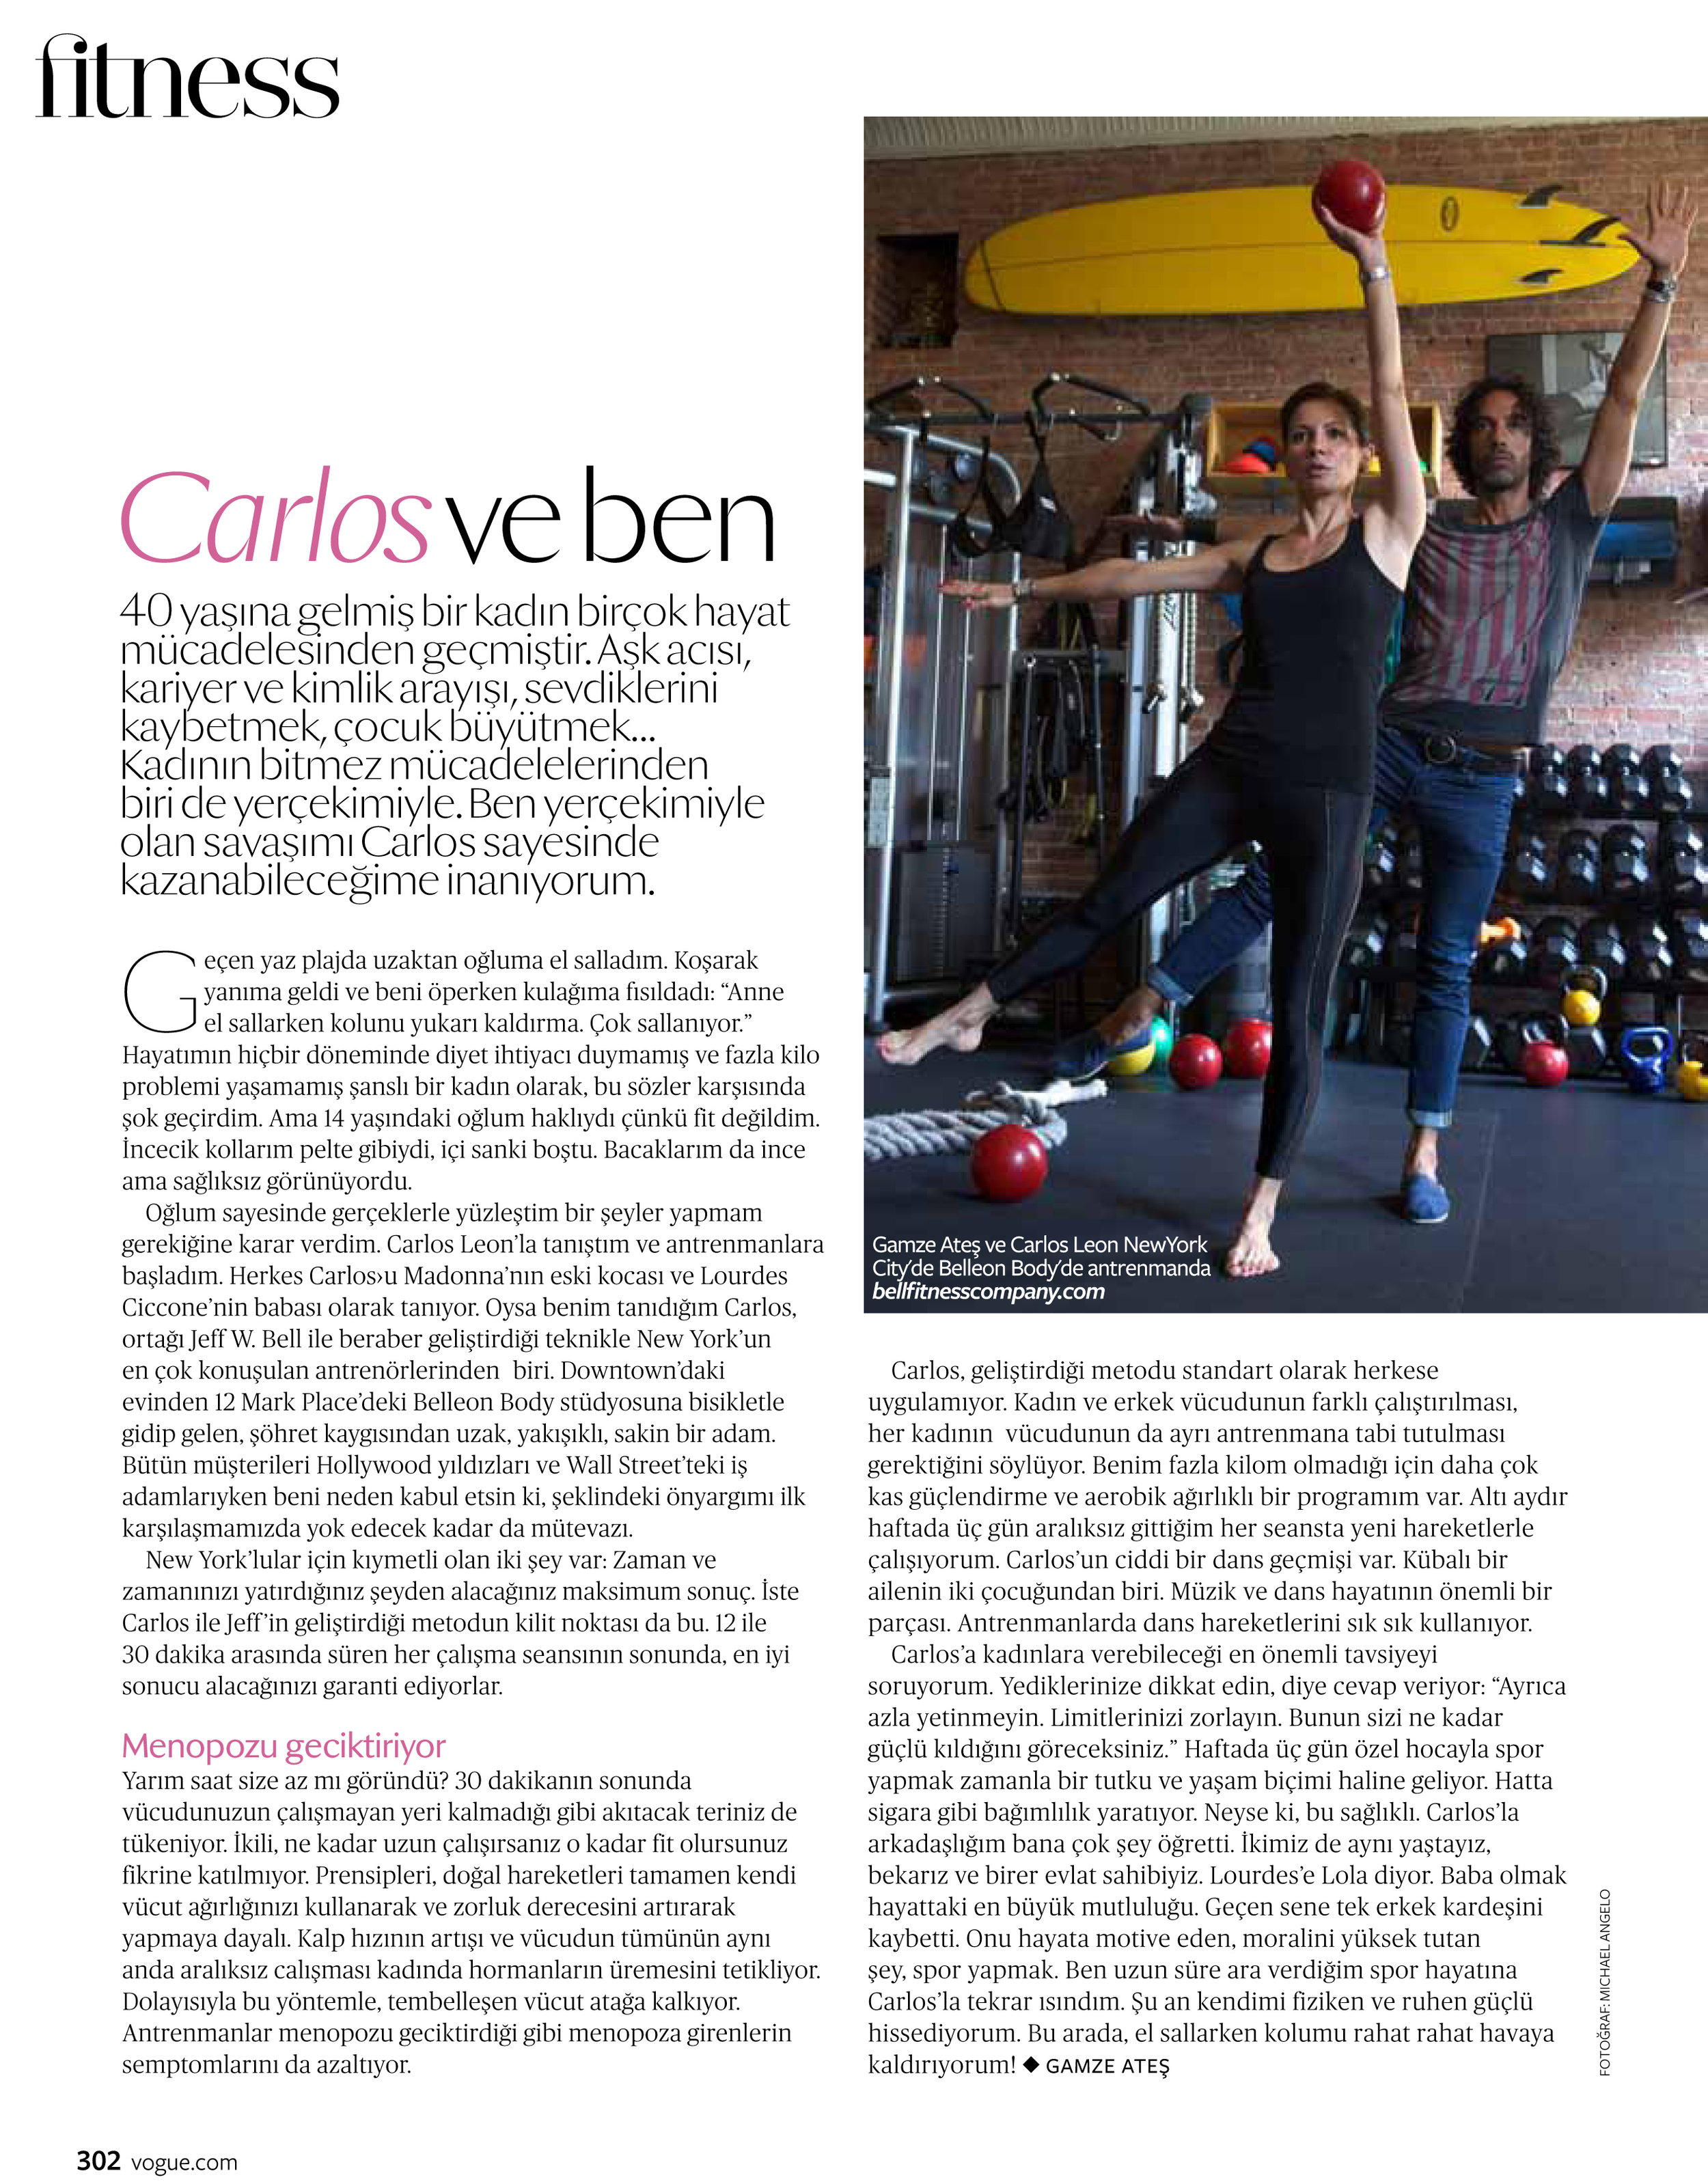 Vogue Turkey fitness.jpg